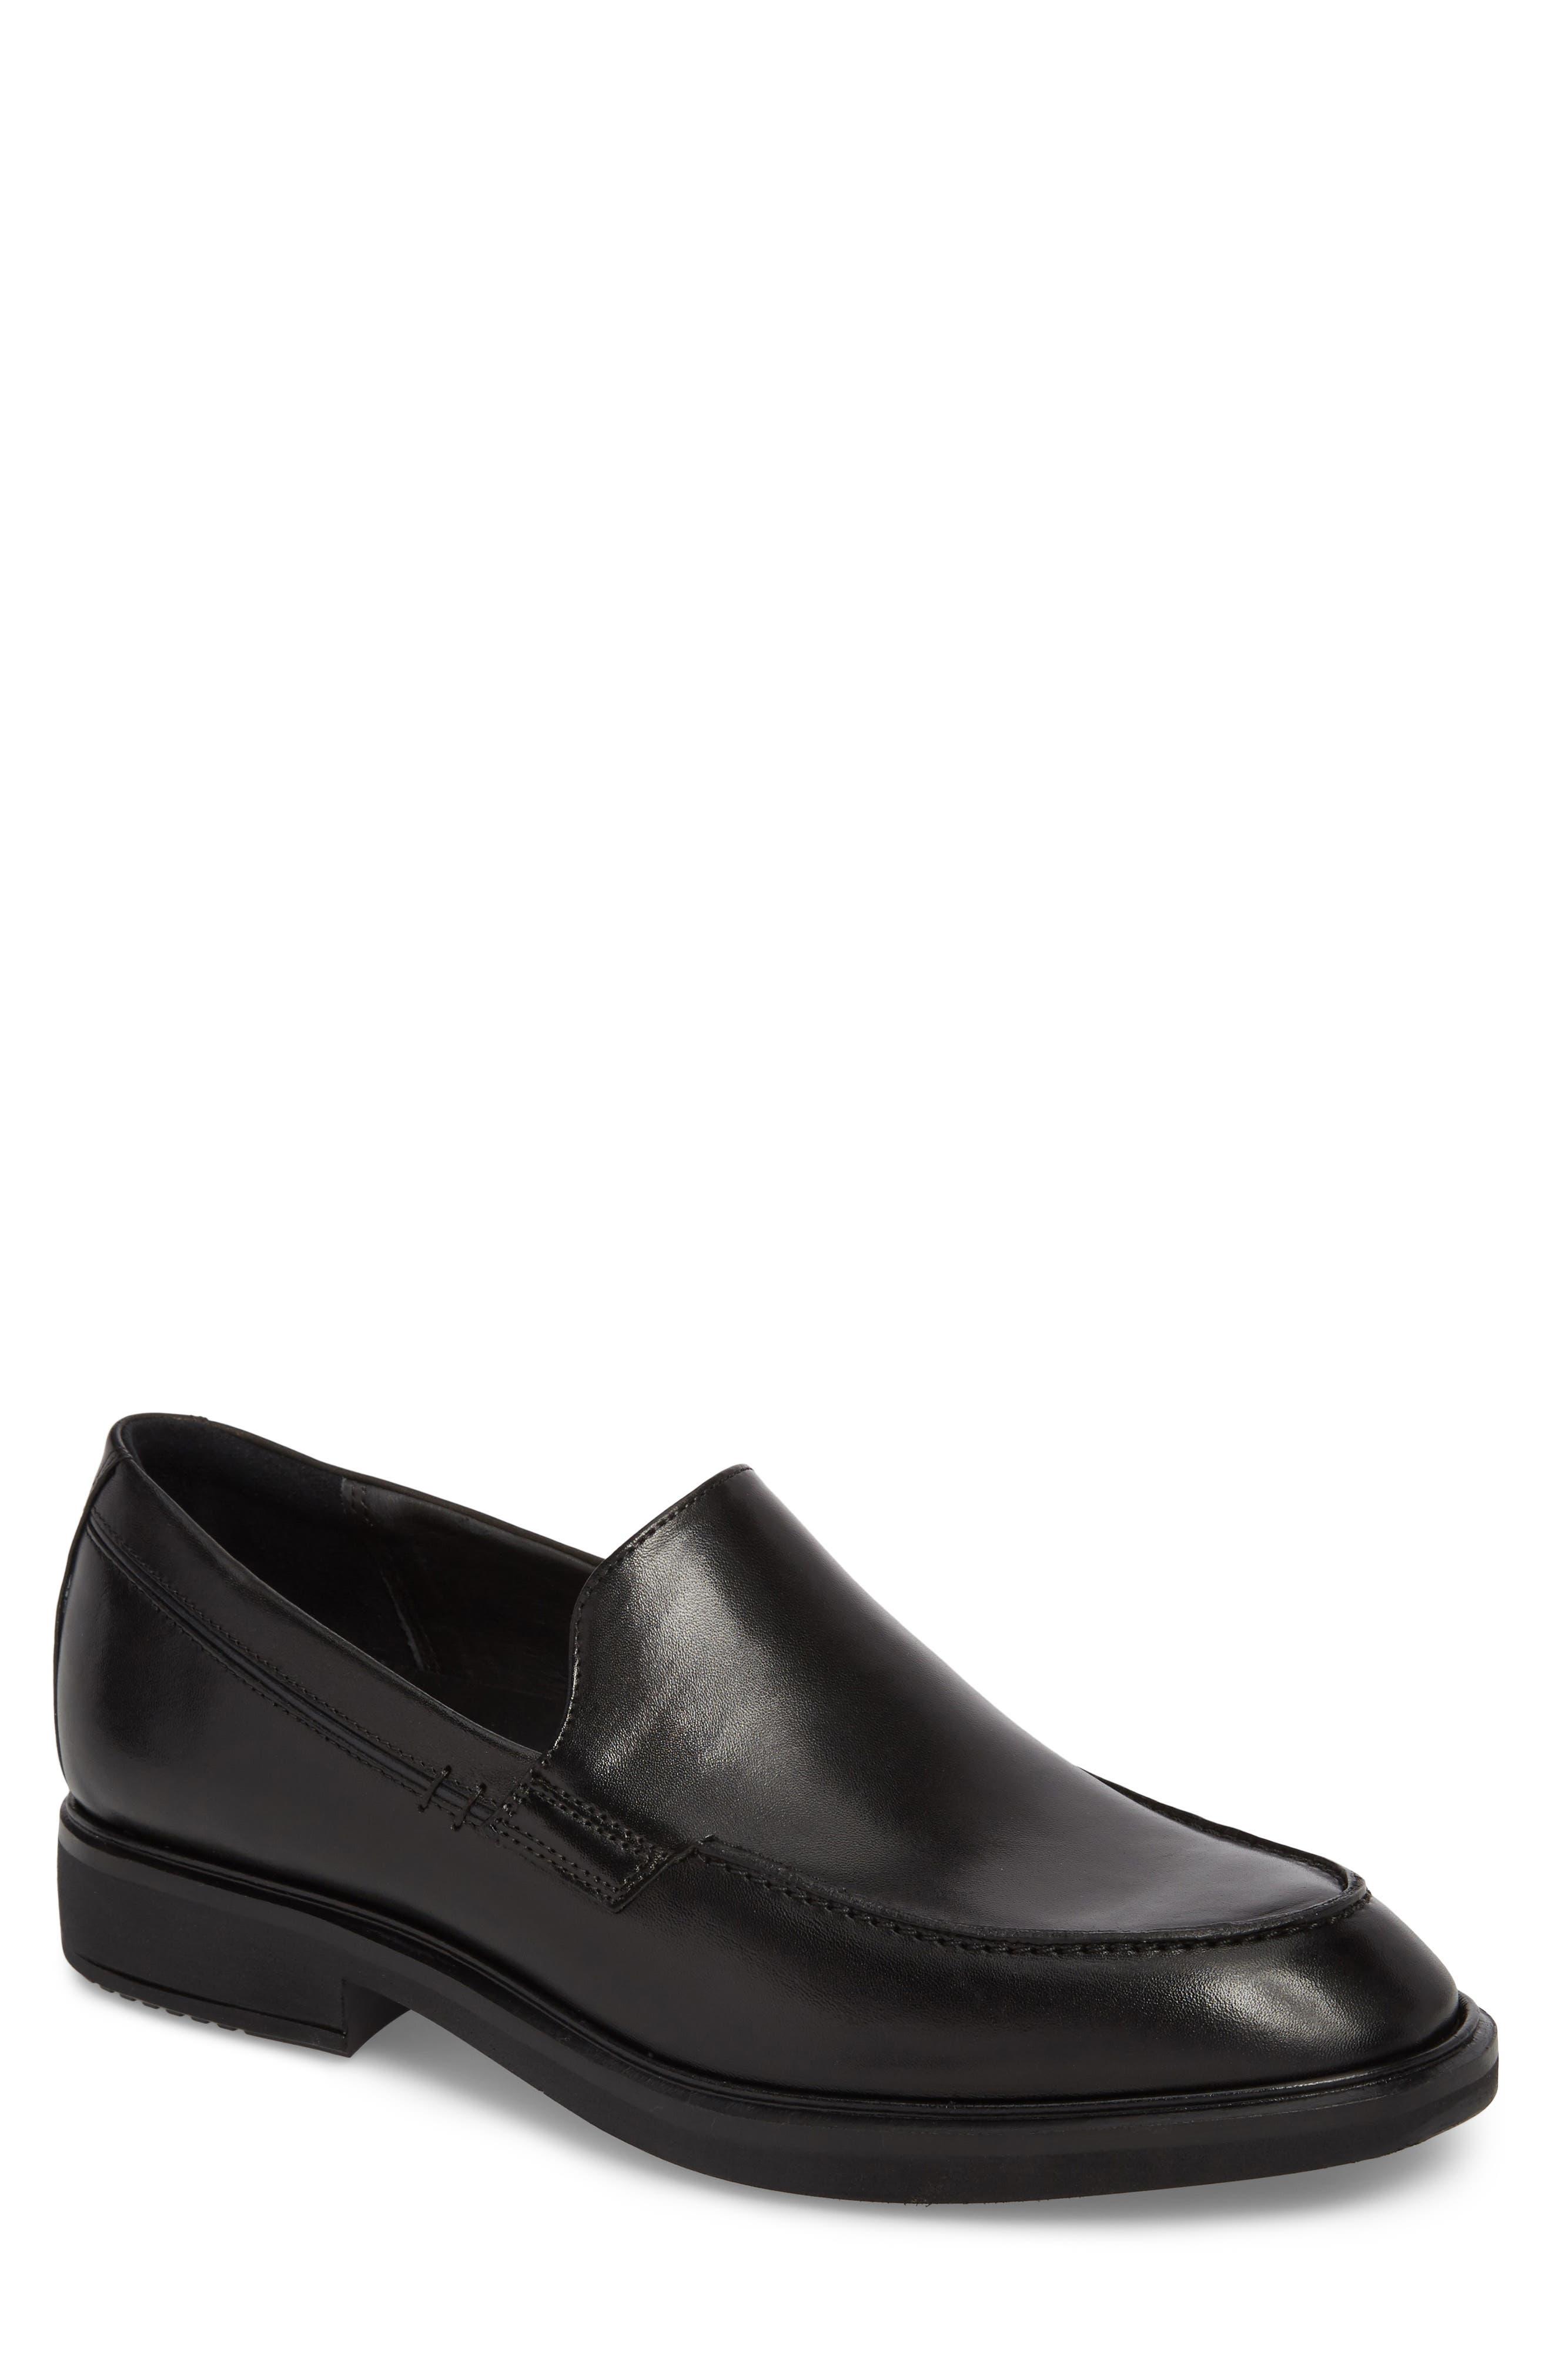 Vitrus II Apron Toe Loafer,                             Main thumbnail 1, color,                             Black Leather